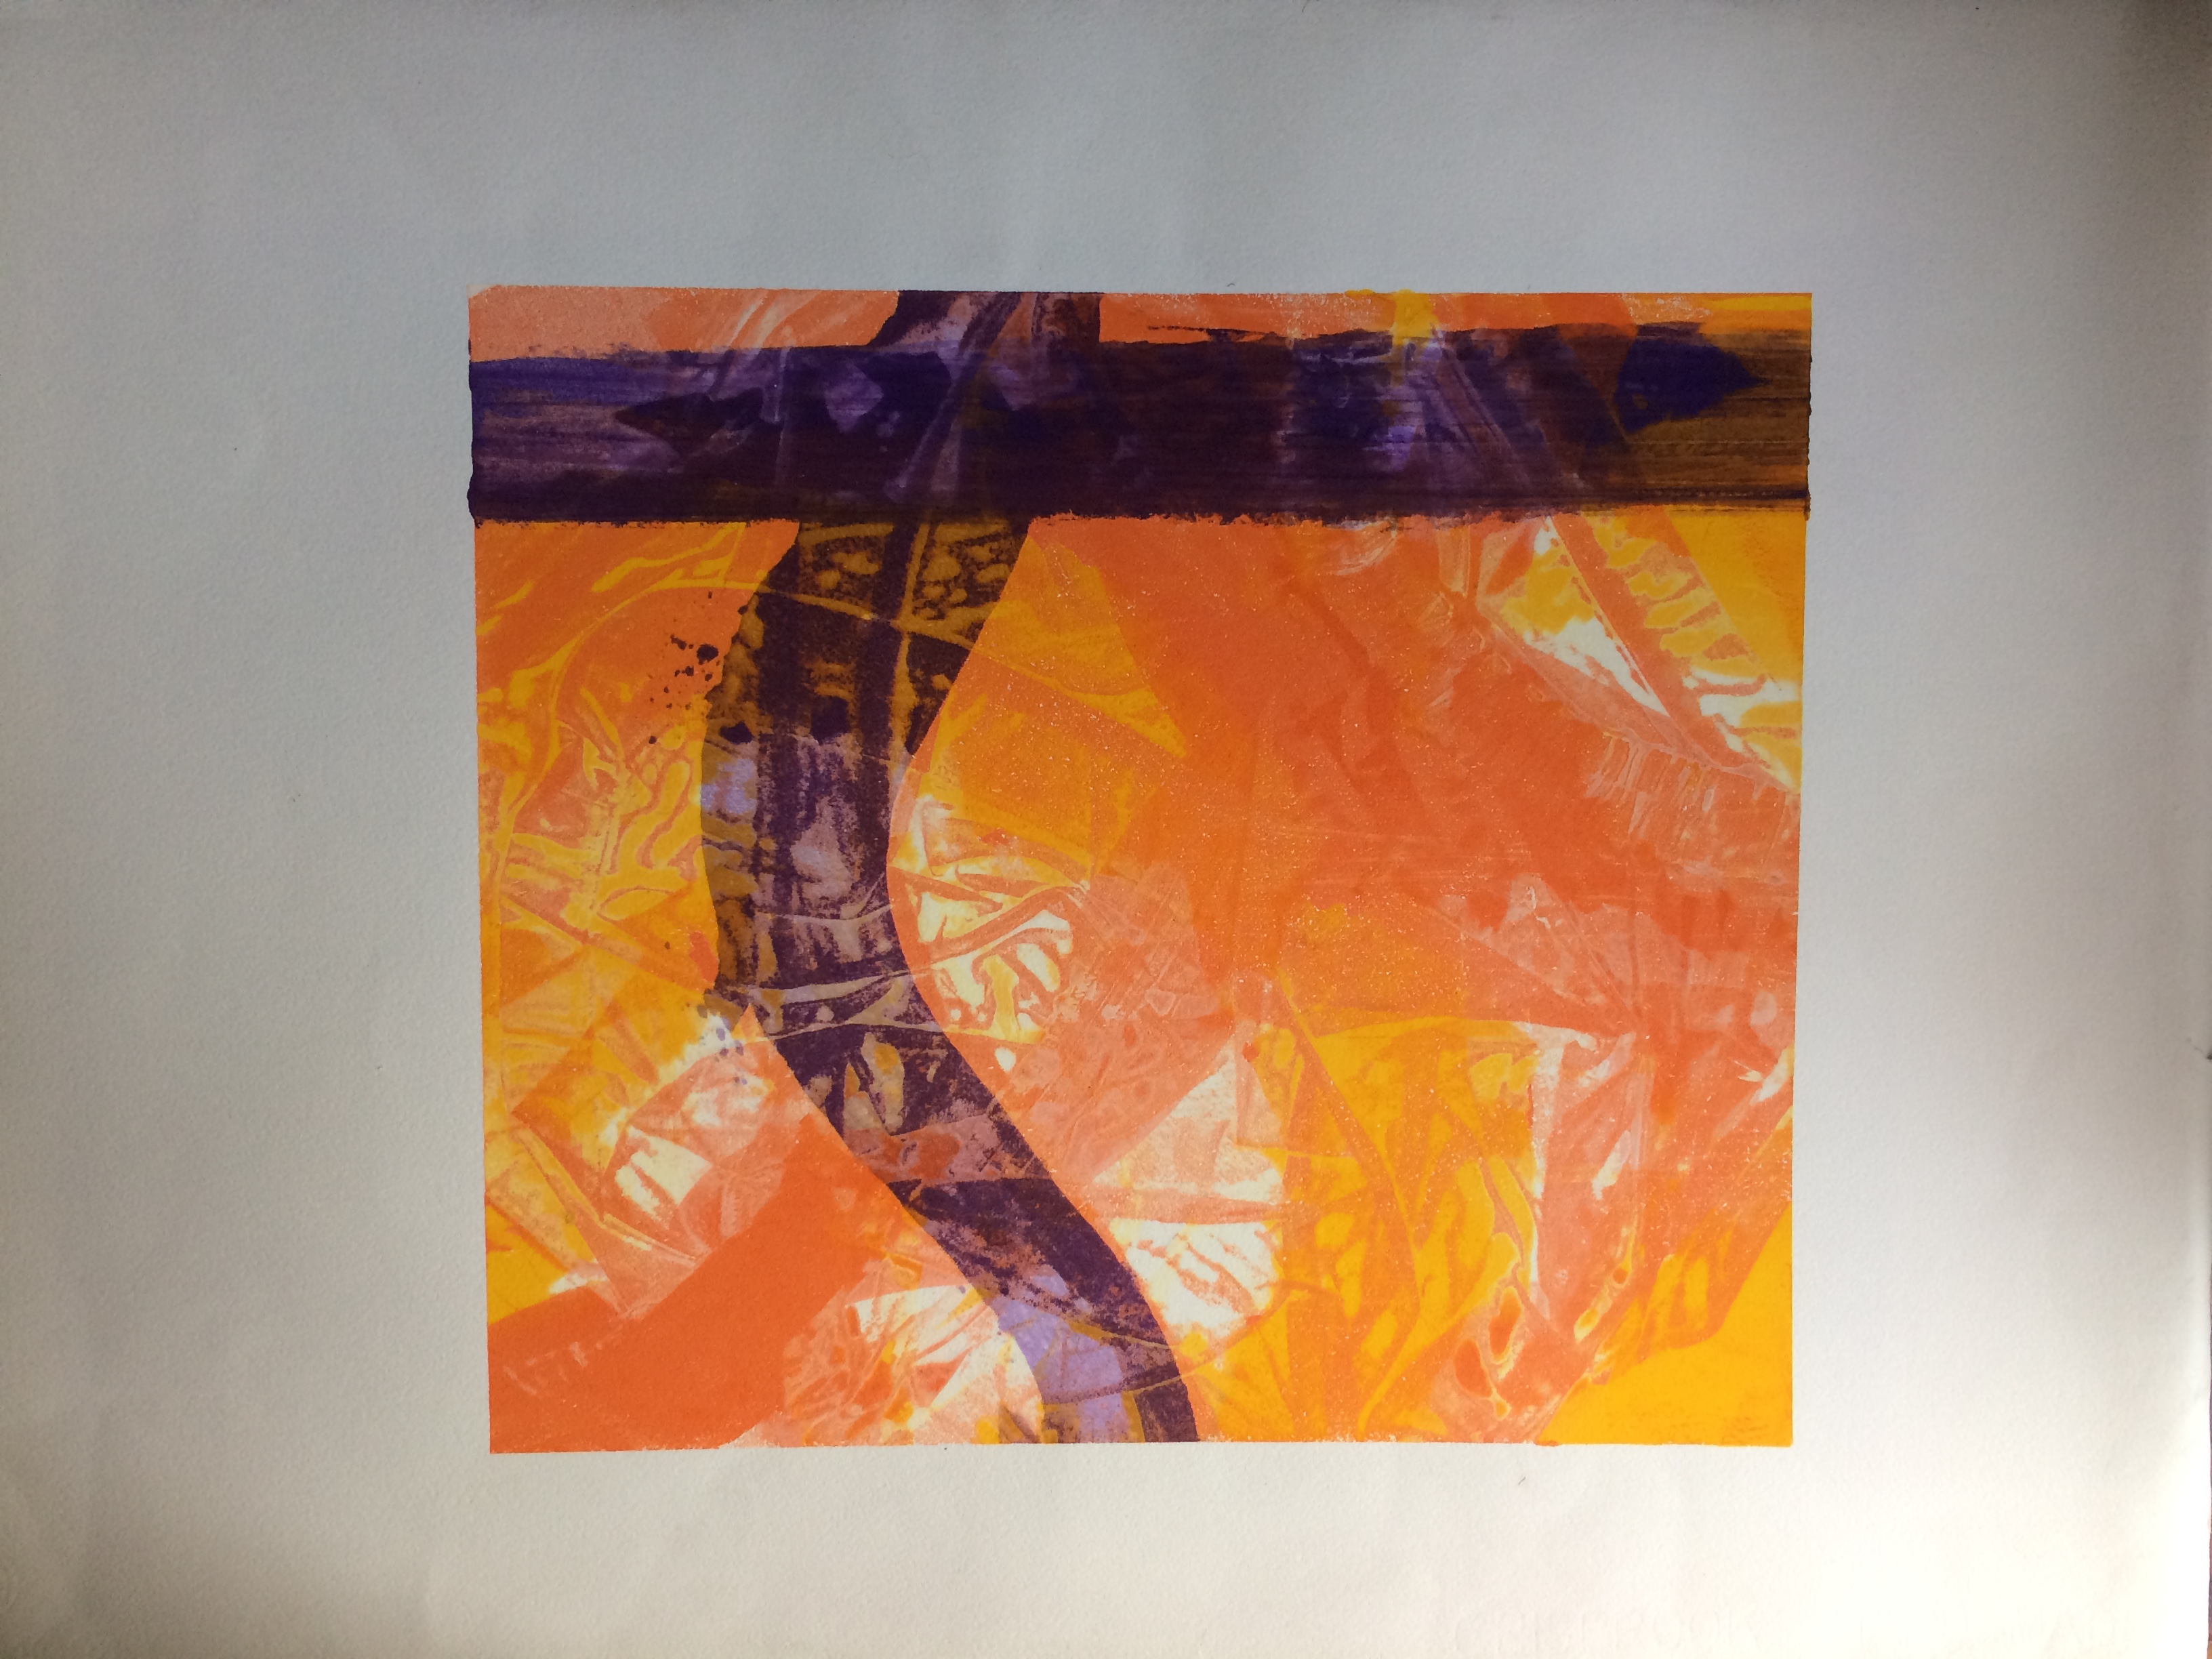 056 Monoprint 46 x 38